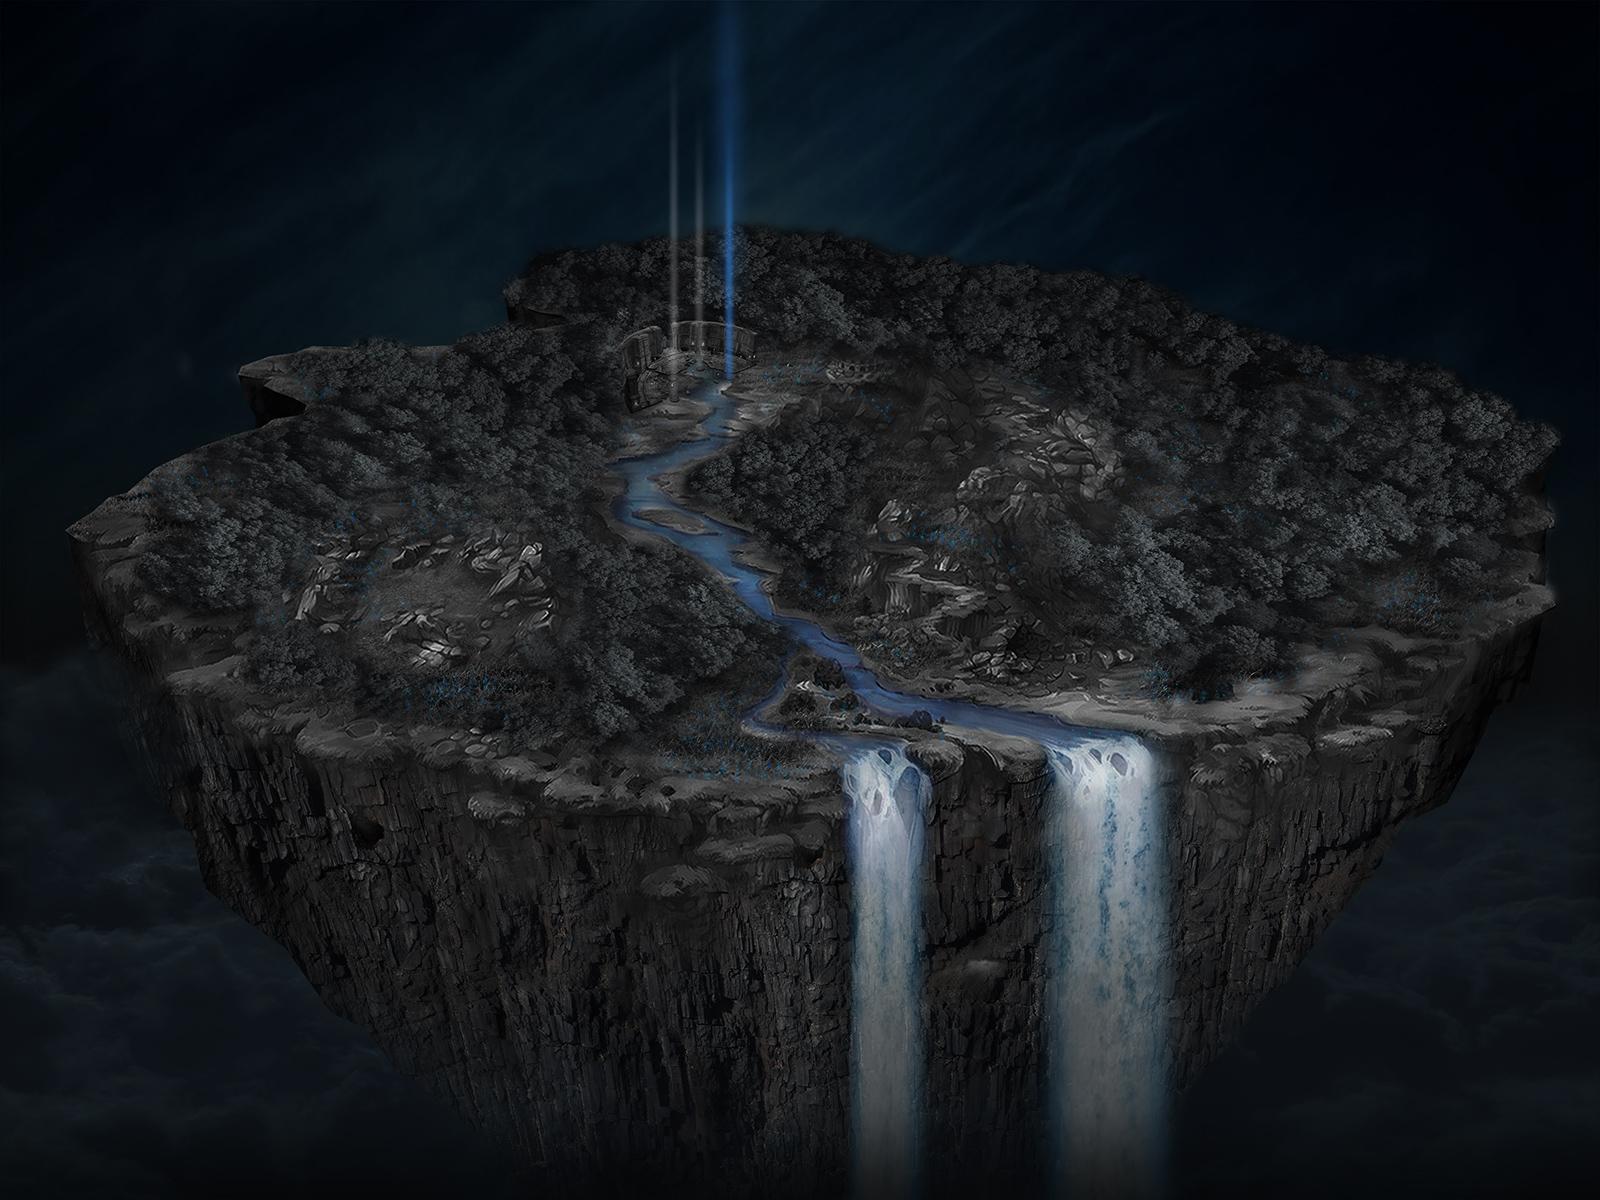 itf-hub-concept-2-water.jpg